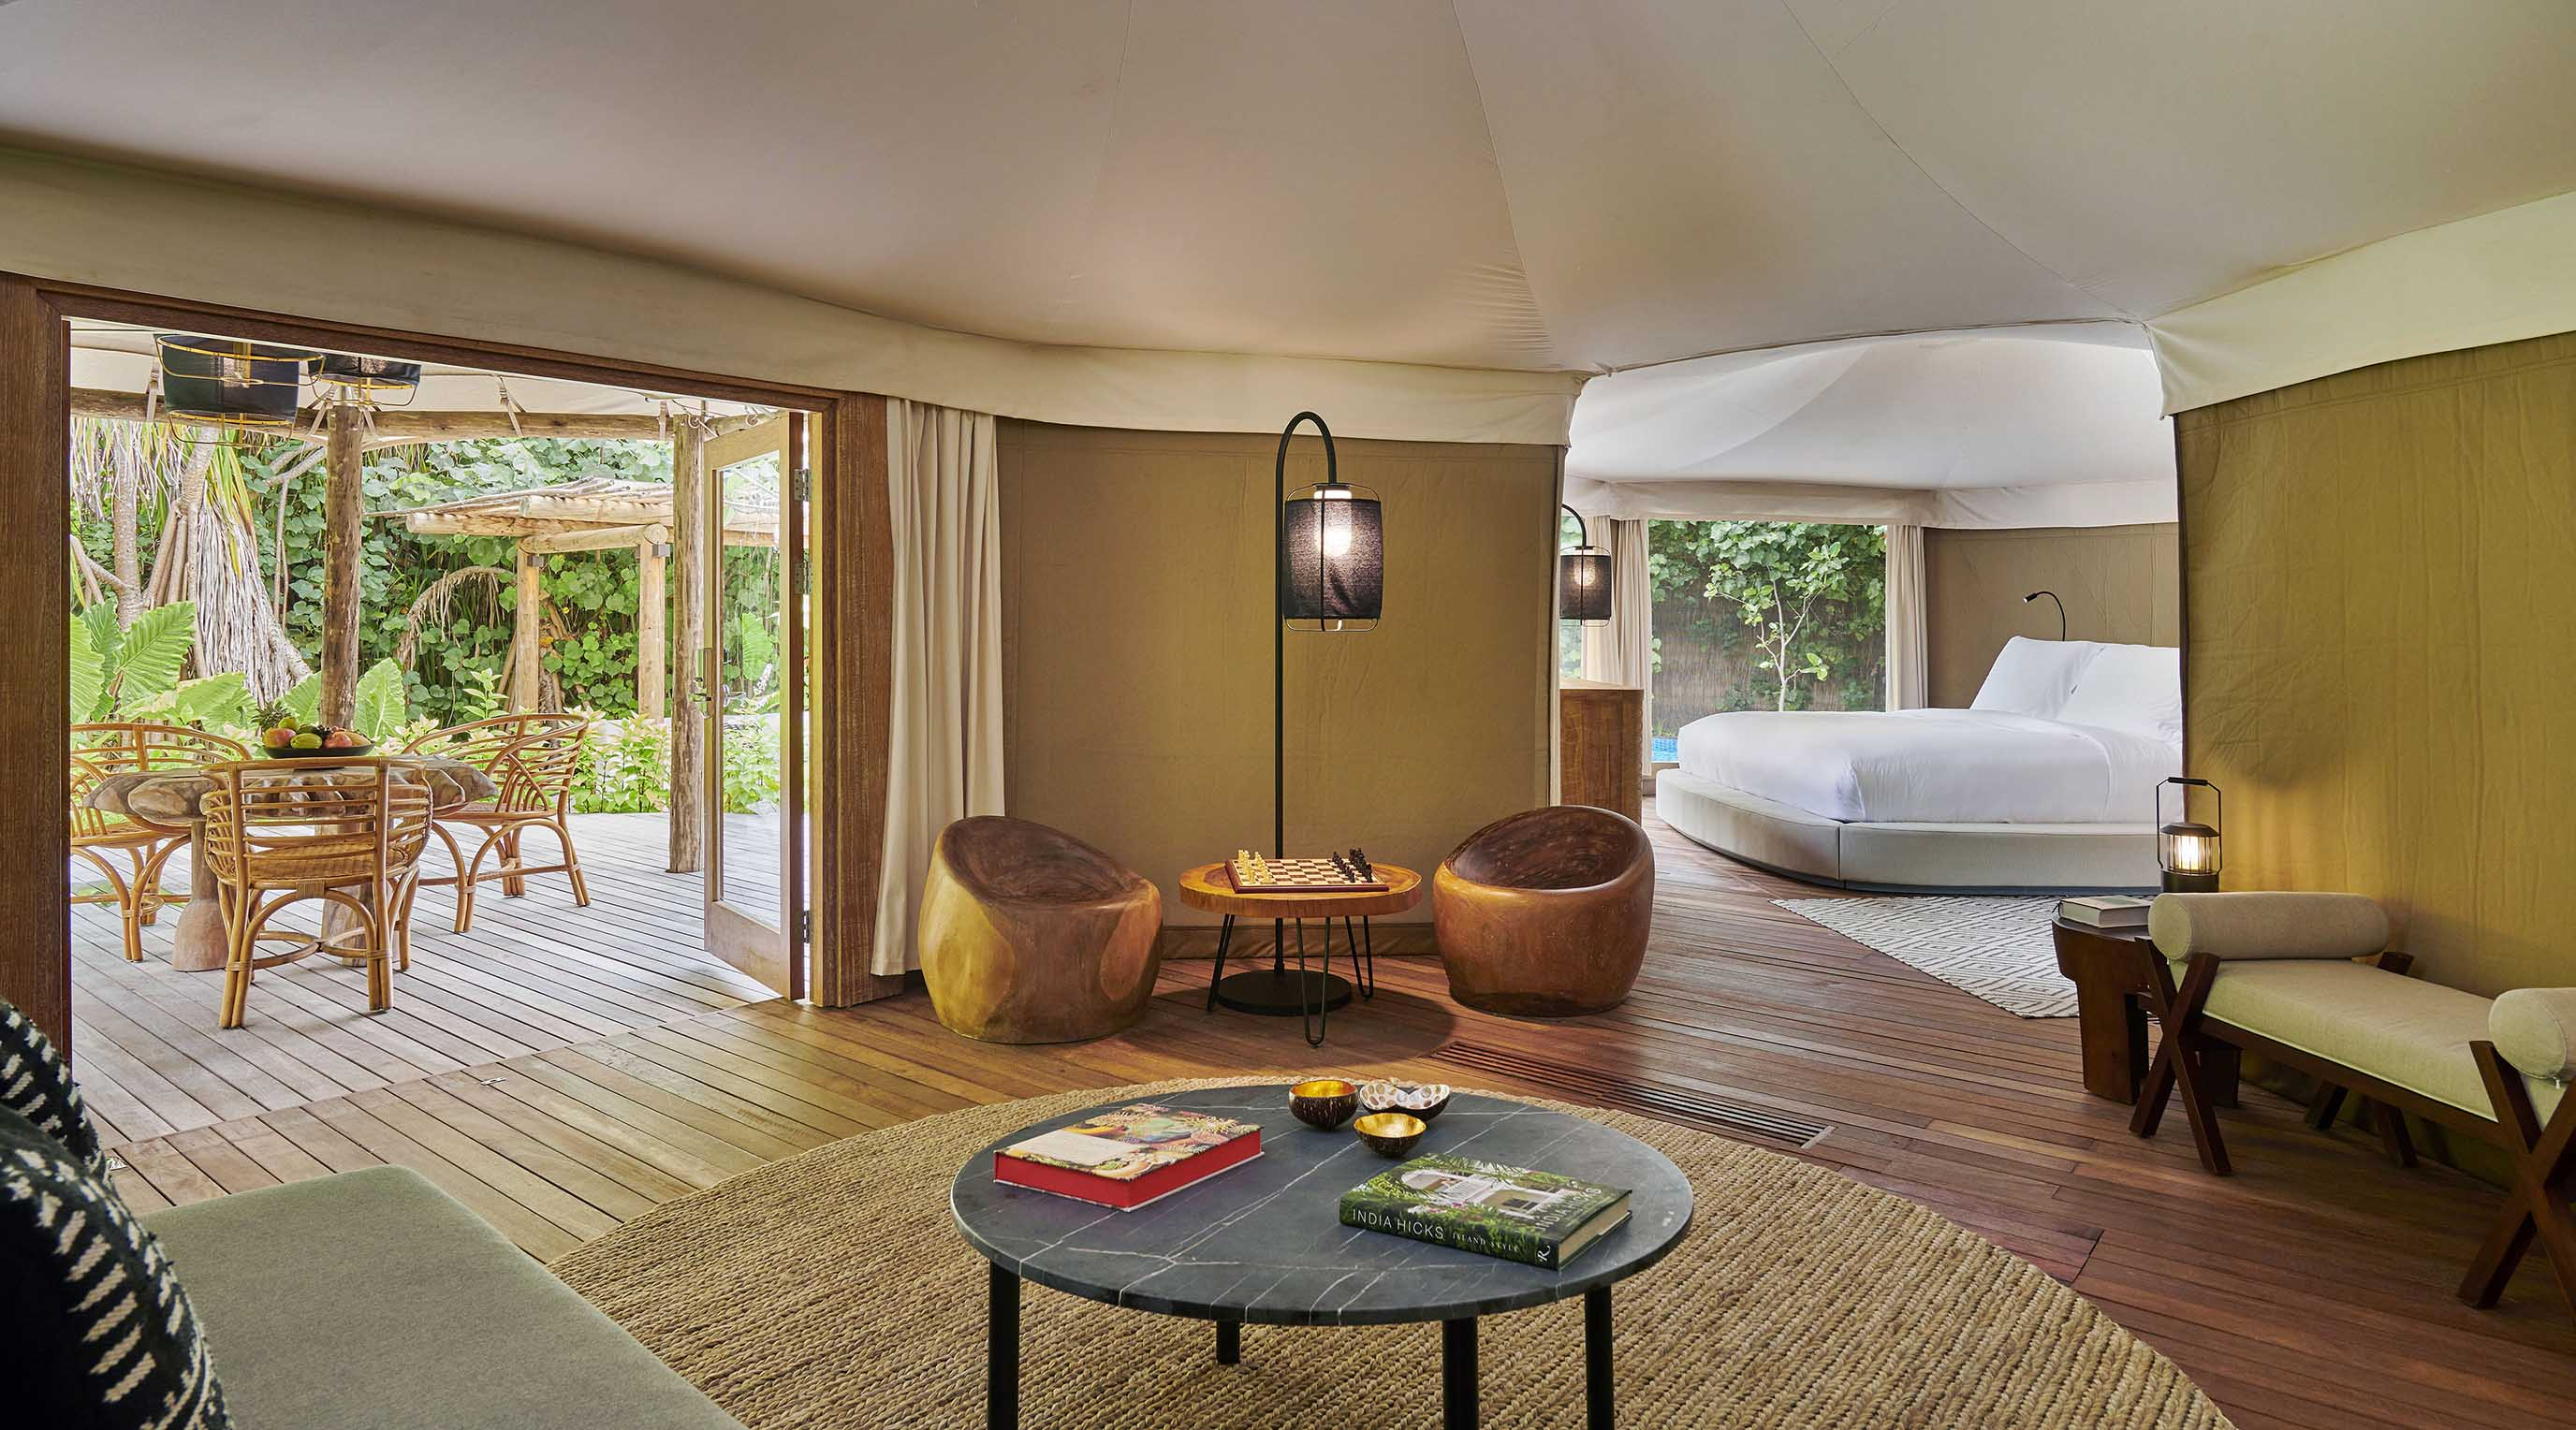 Luxury Tented Jungle Villa interior